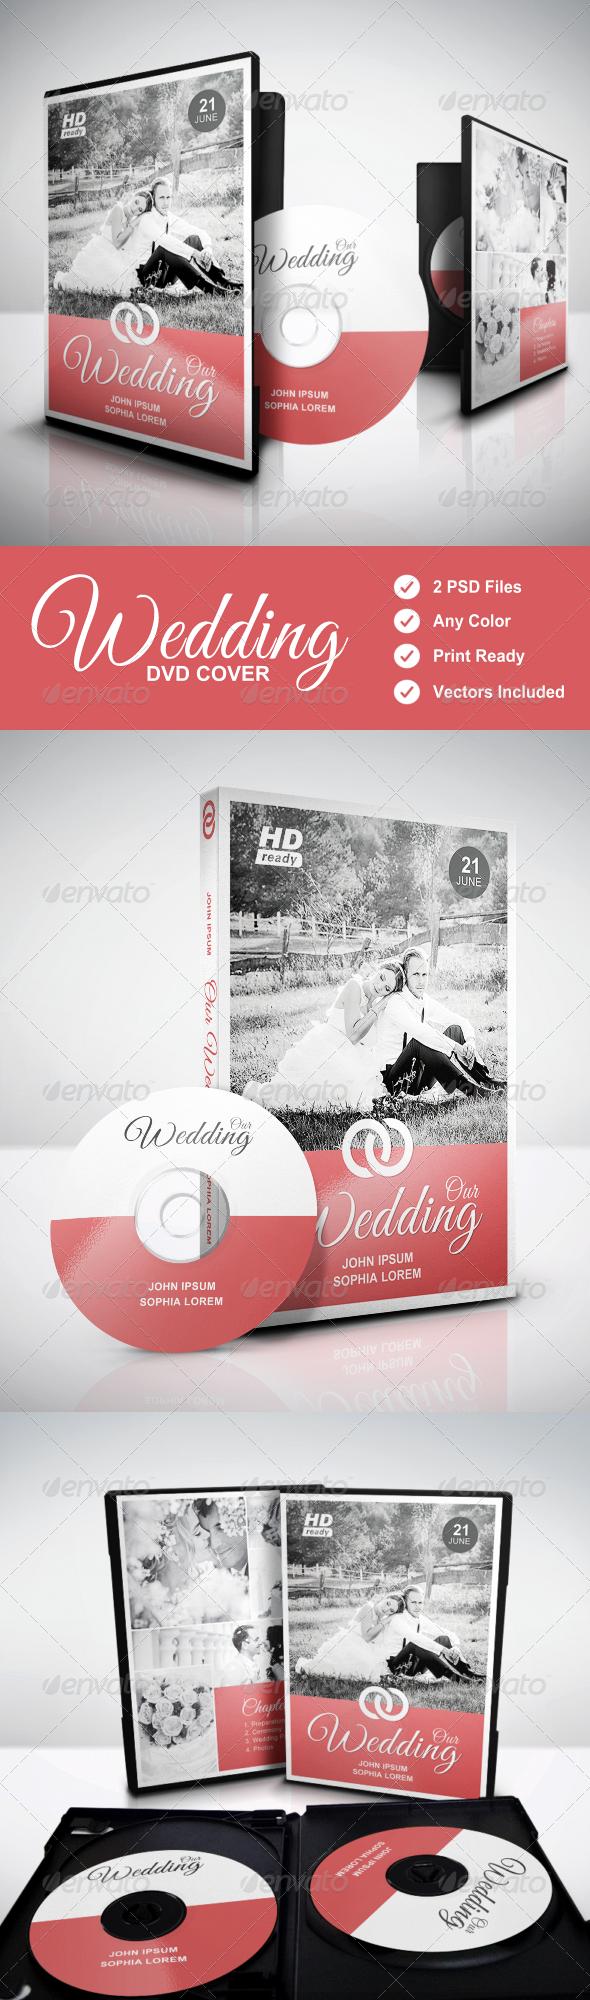 GraphicRiver Wedding DVD Cover vol.3 7782532